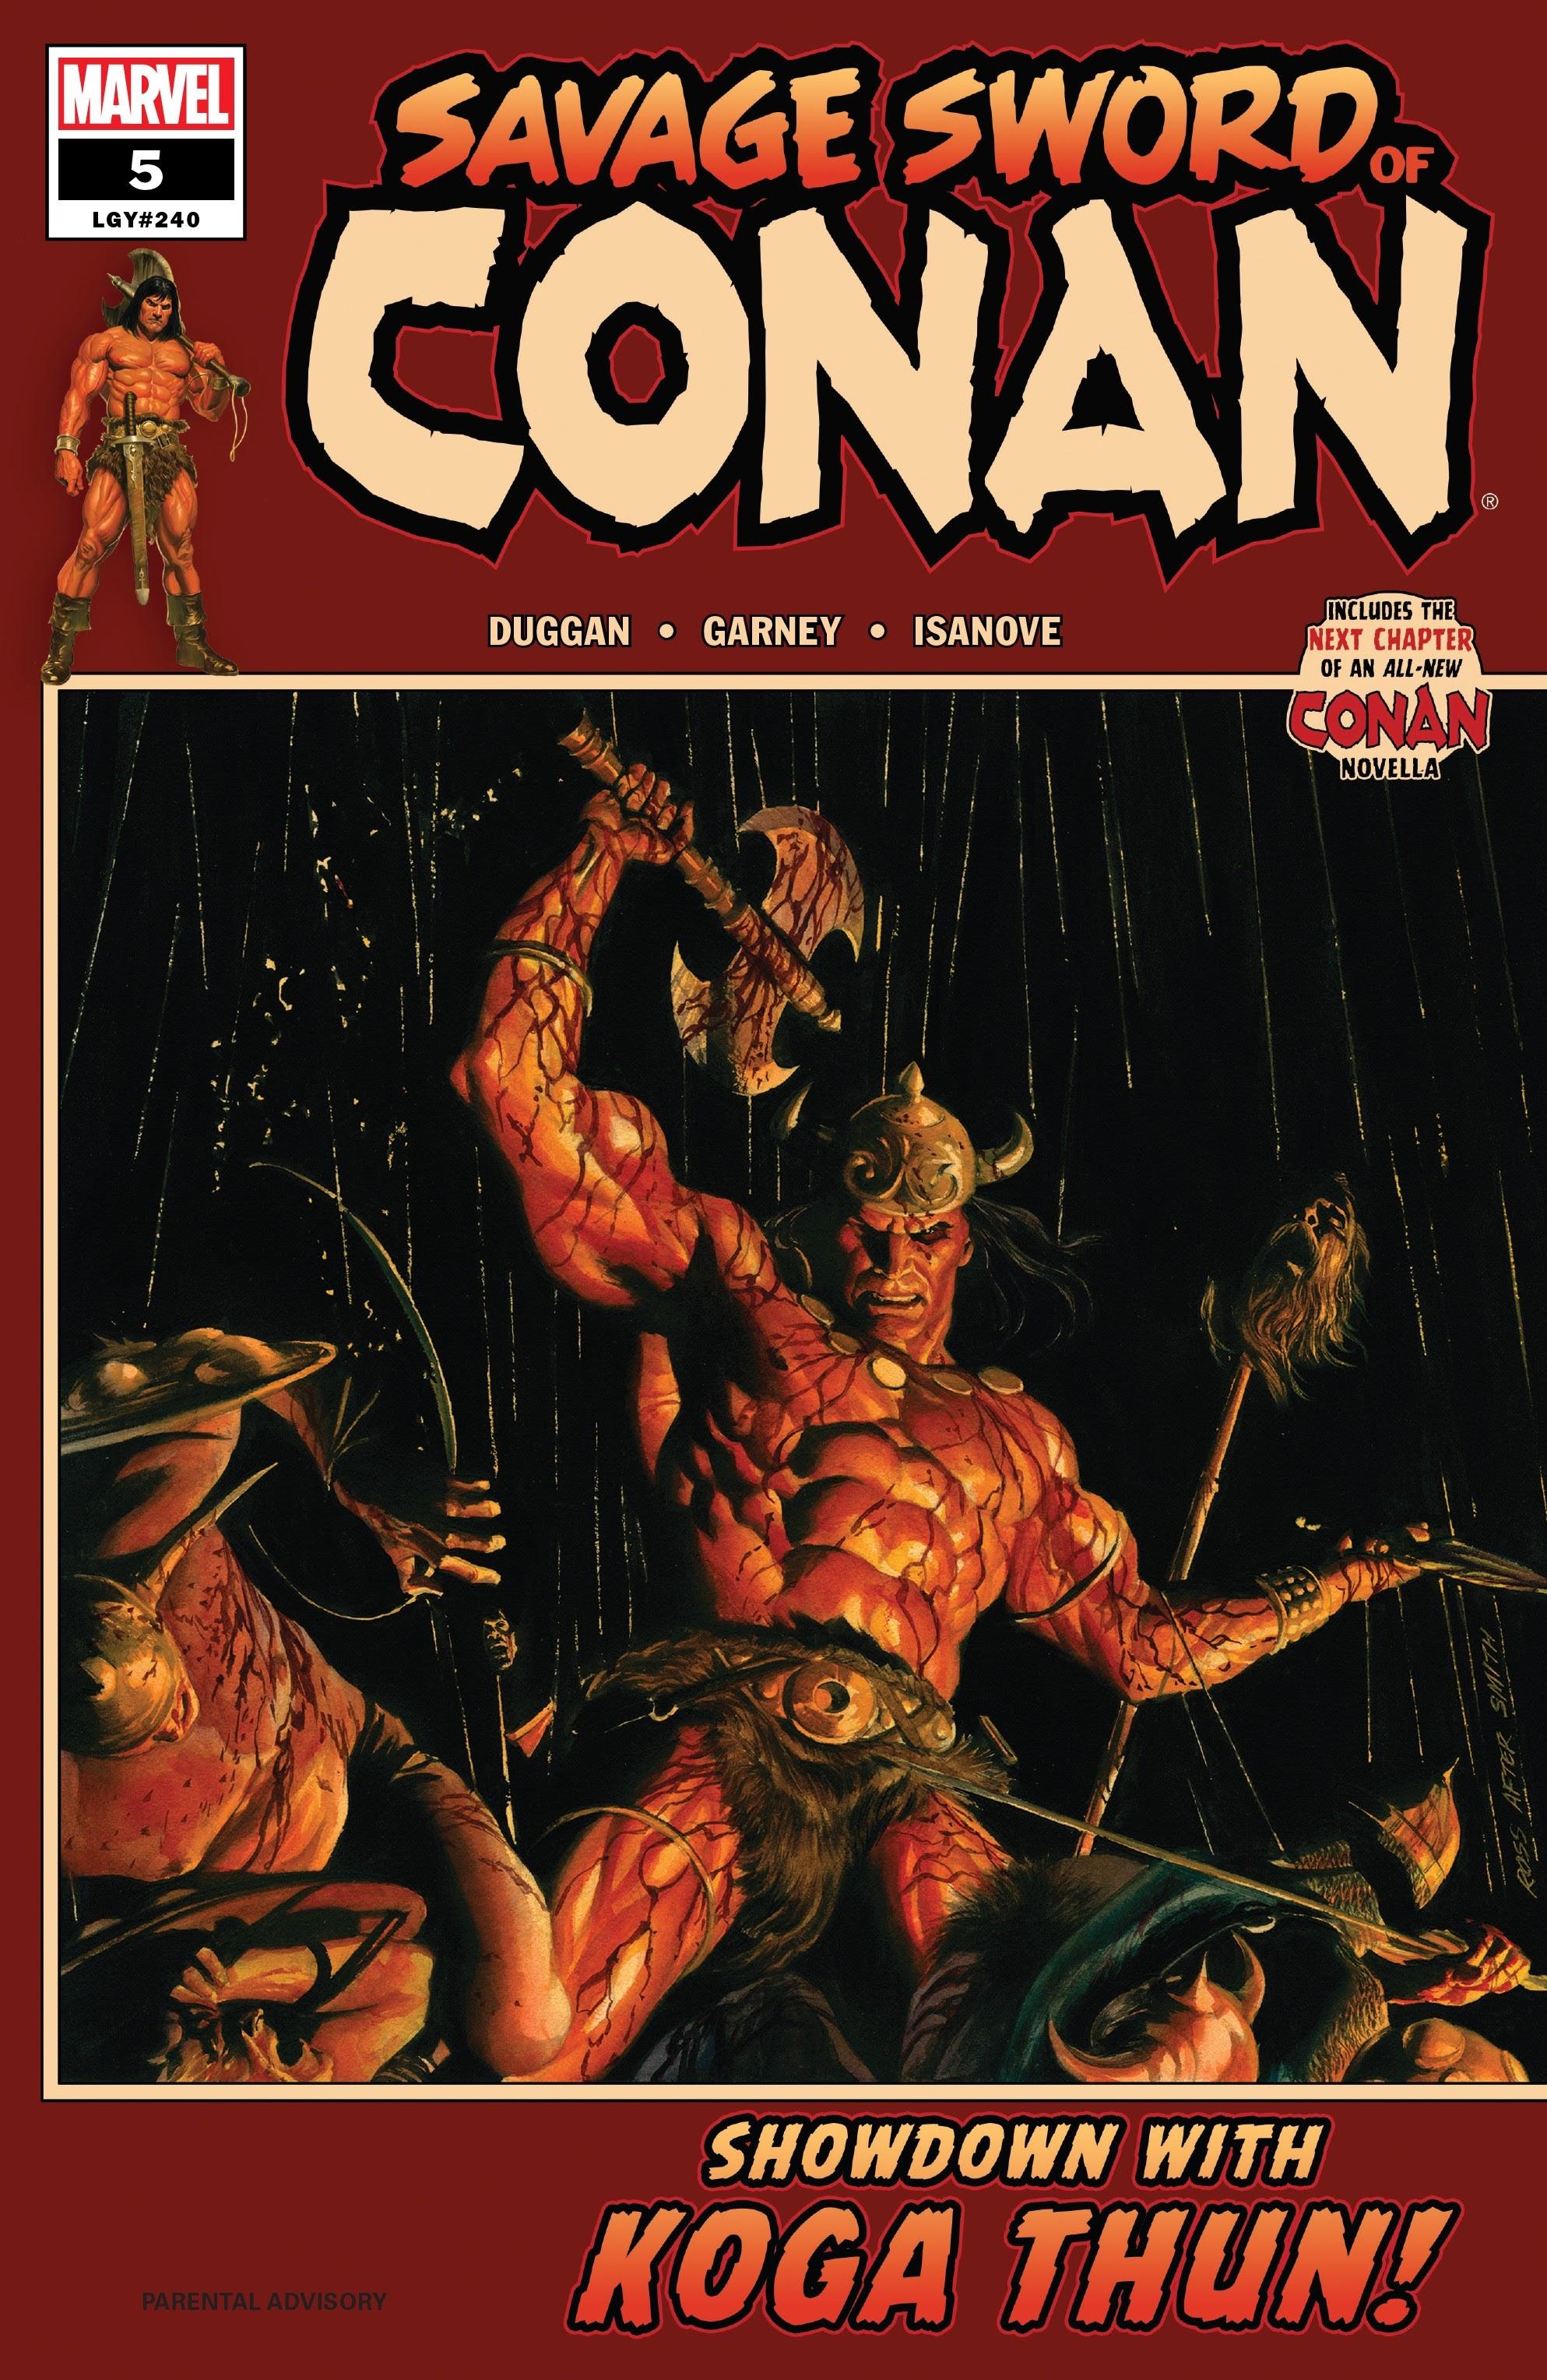 Savage Sword of Conan 5 Page 1